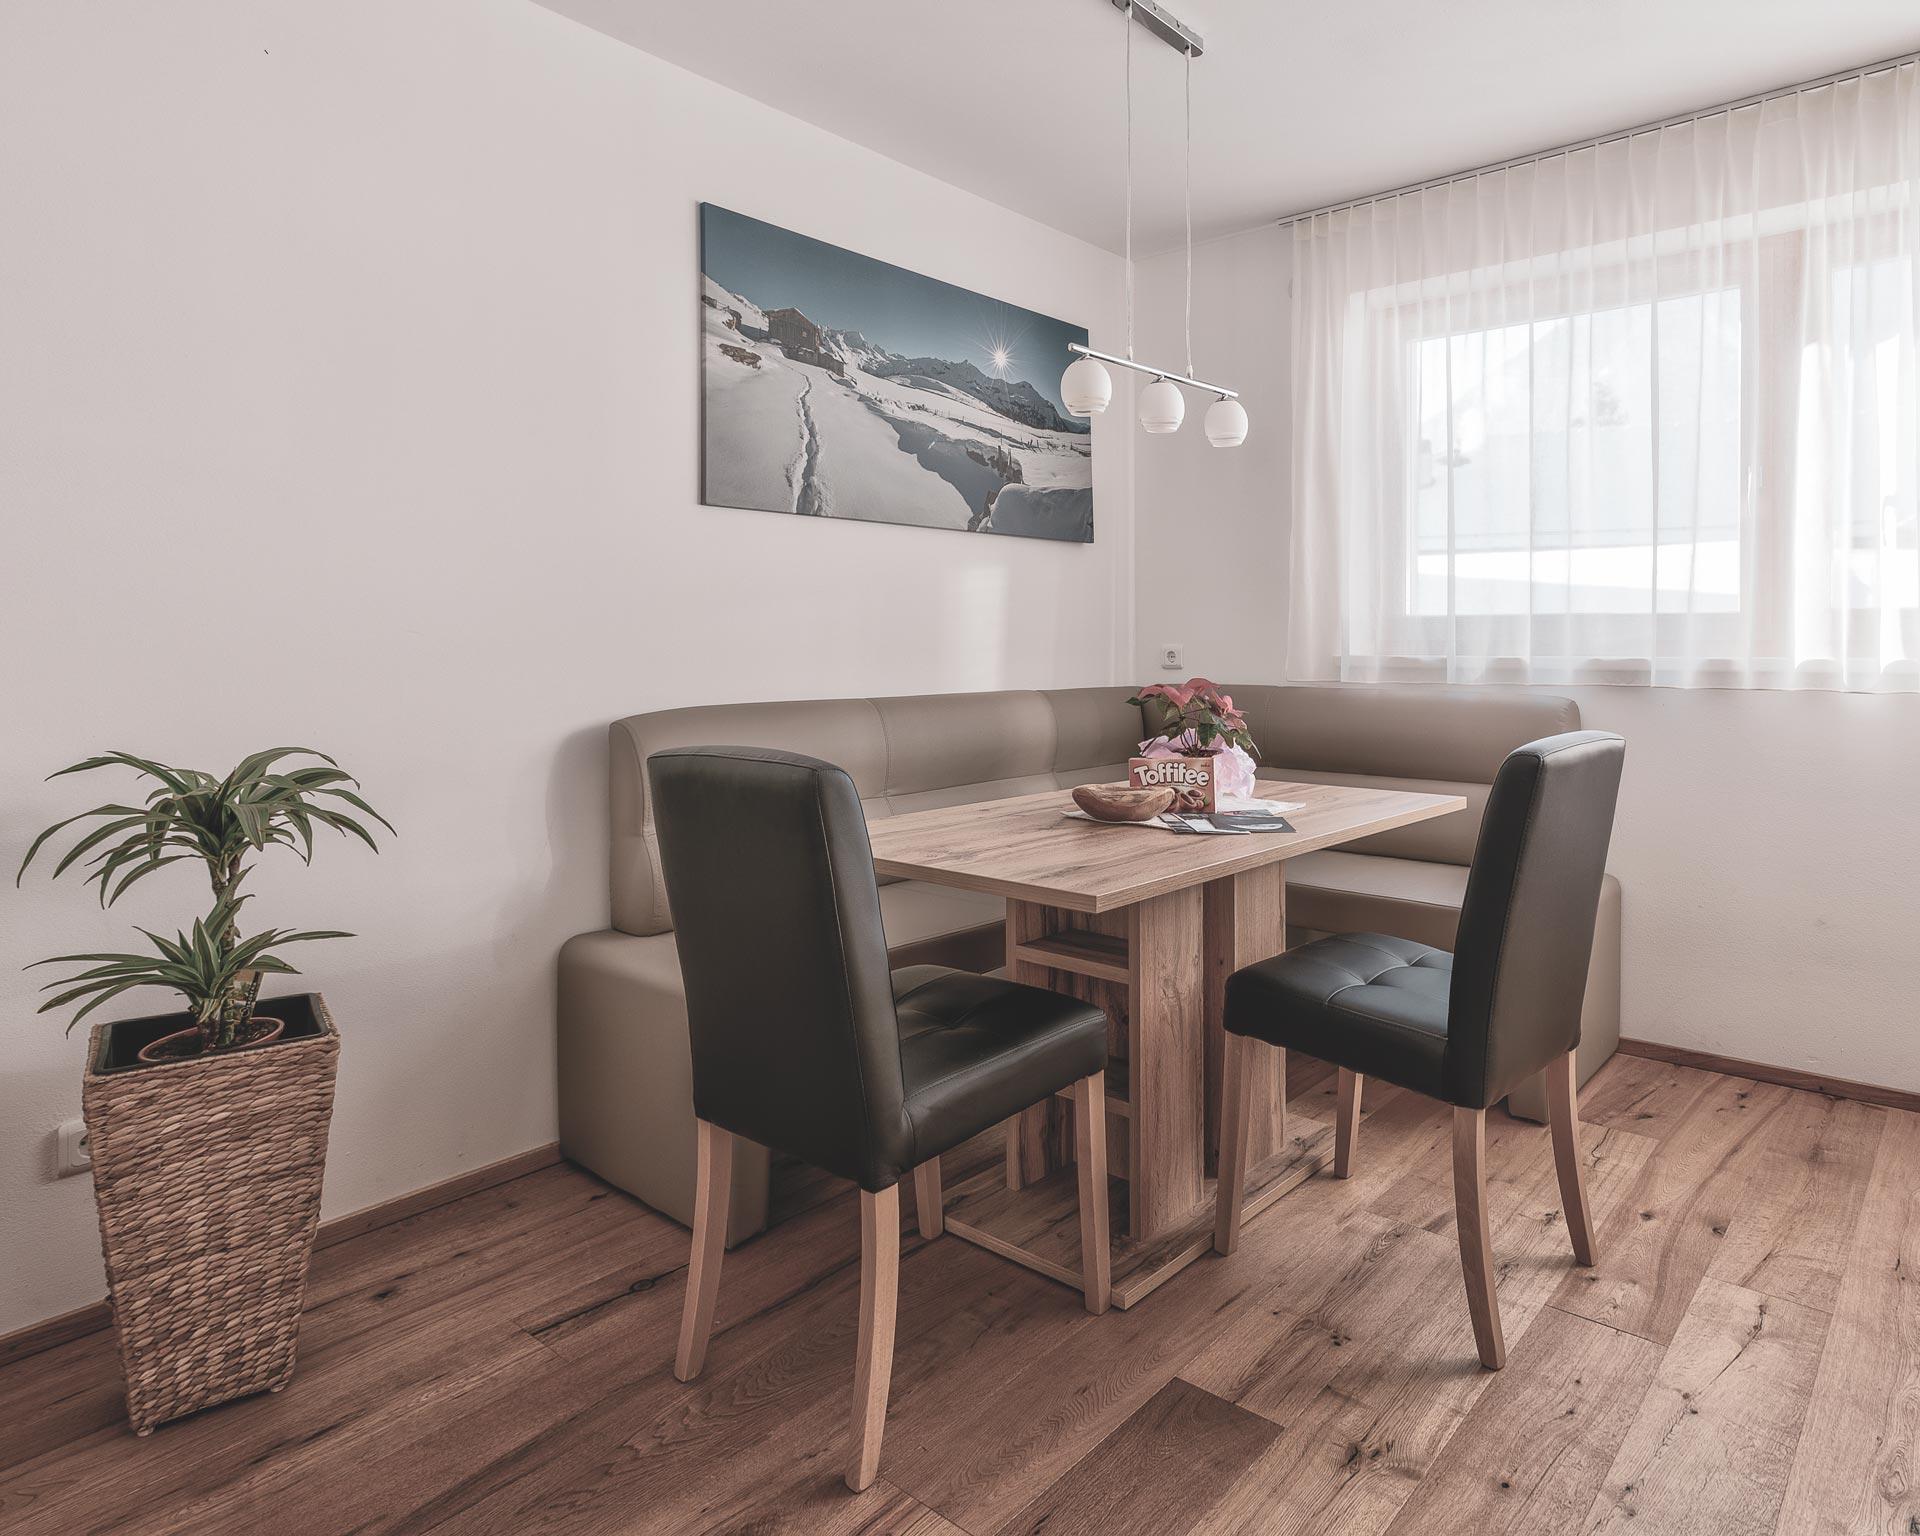 chalet waldblick 2 wohnkueche pfarrwirt appartements sand in taufers